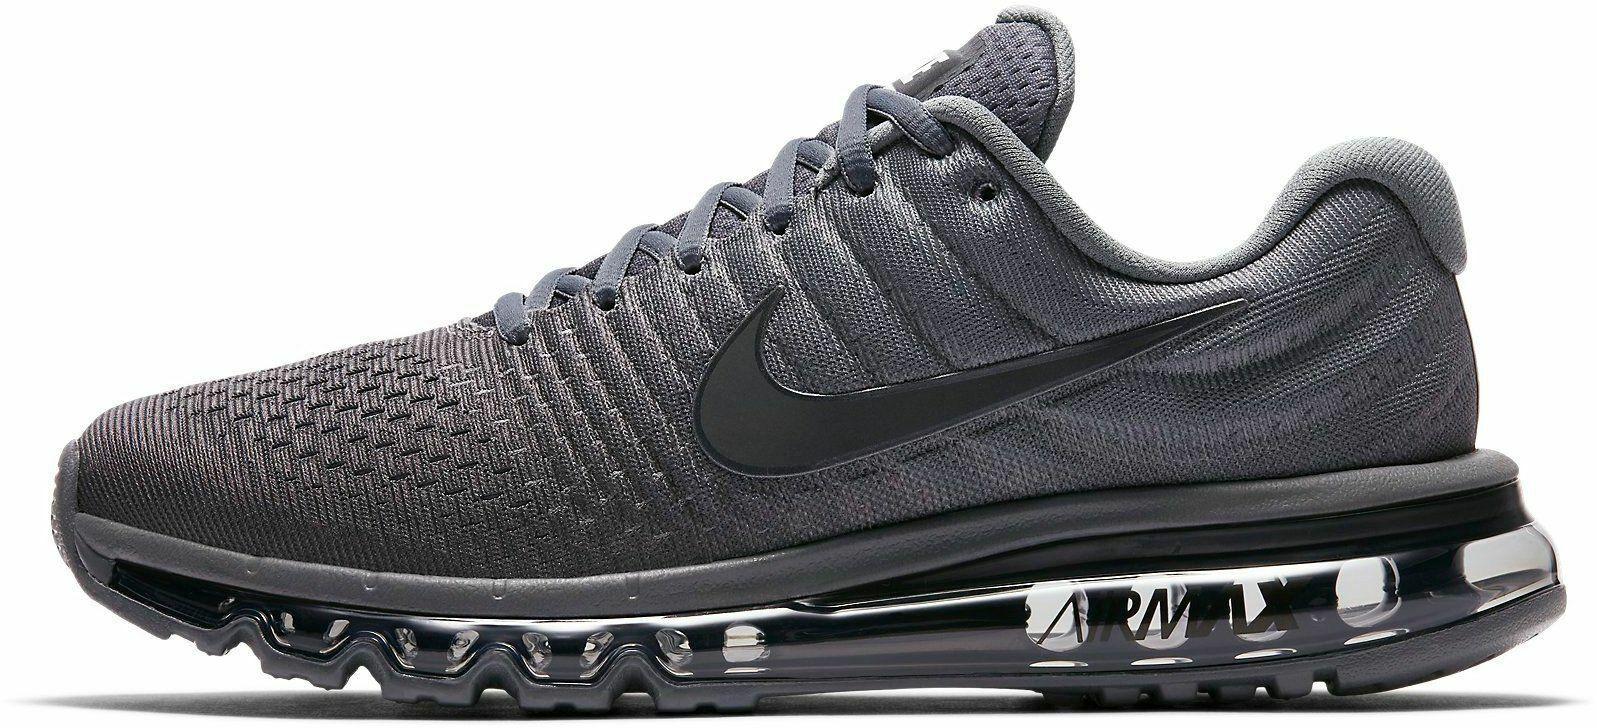 Nike Air Max 2017 Mens Cool GreyAnthraciteDark Grey UK Online